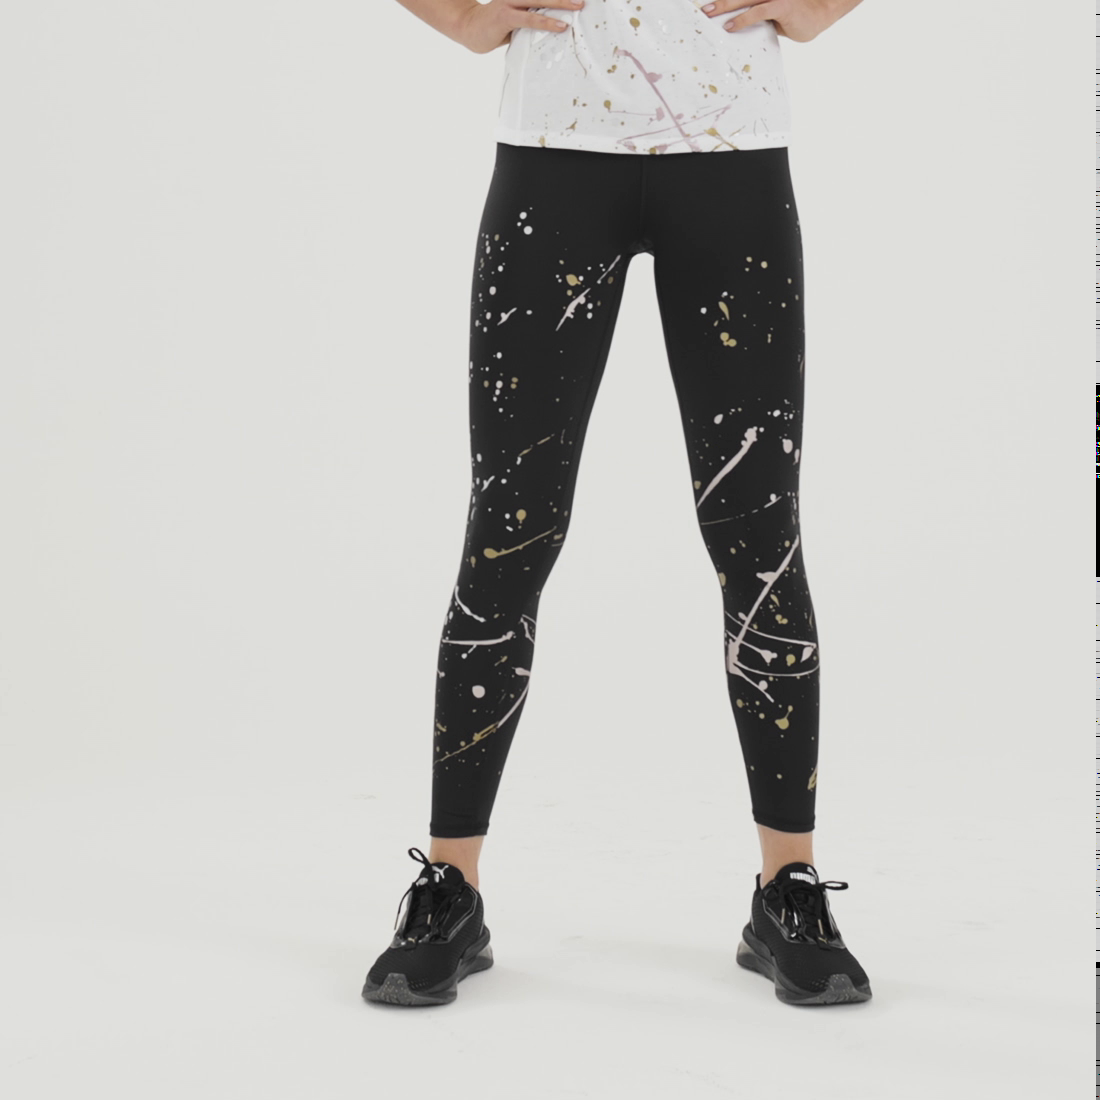 Image PUMA Legging Metal Splash Splatter Feminina #6